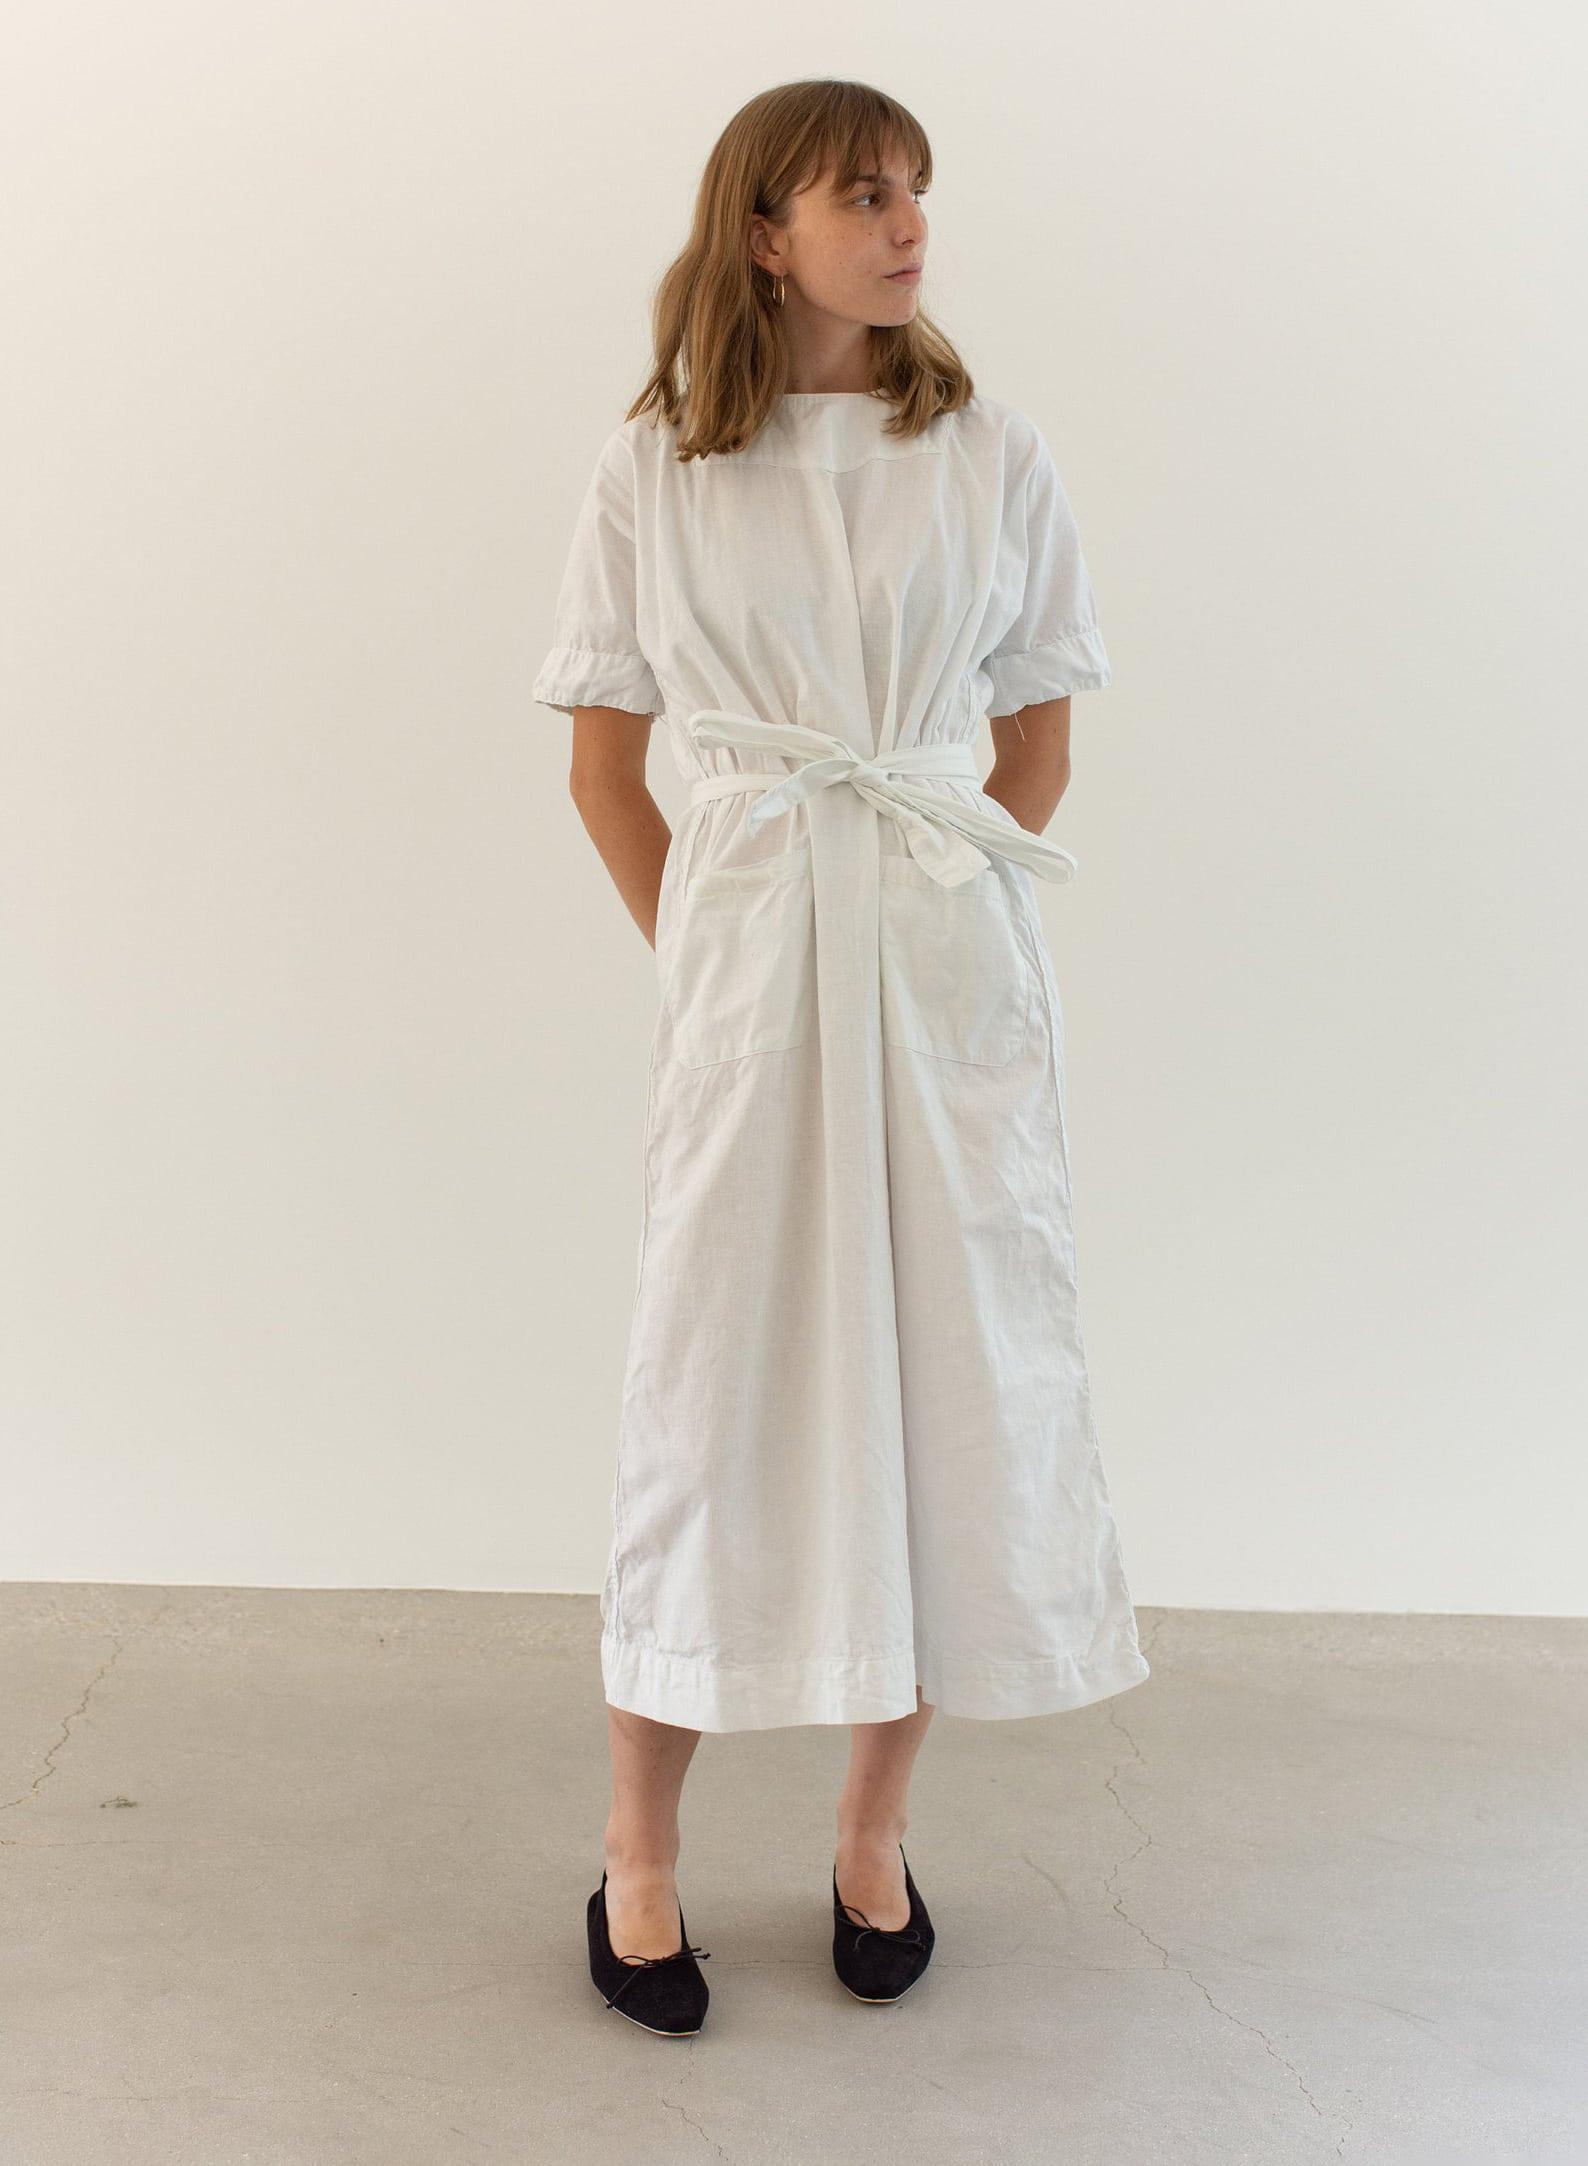 Vintage White Cotton Dress Snap Back Smock | Round Neck Nightgown Dress | Shift Dress Gown Slip | Vintage Workwear